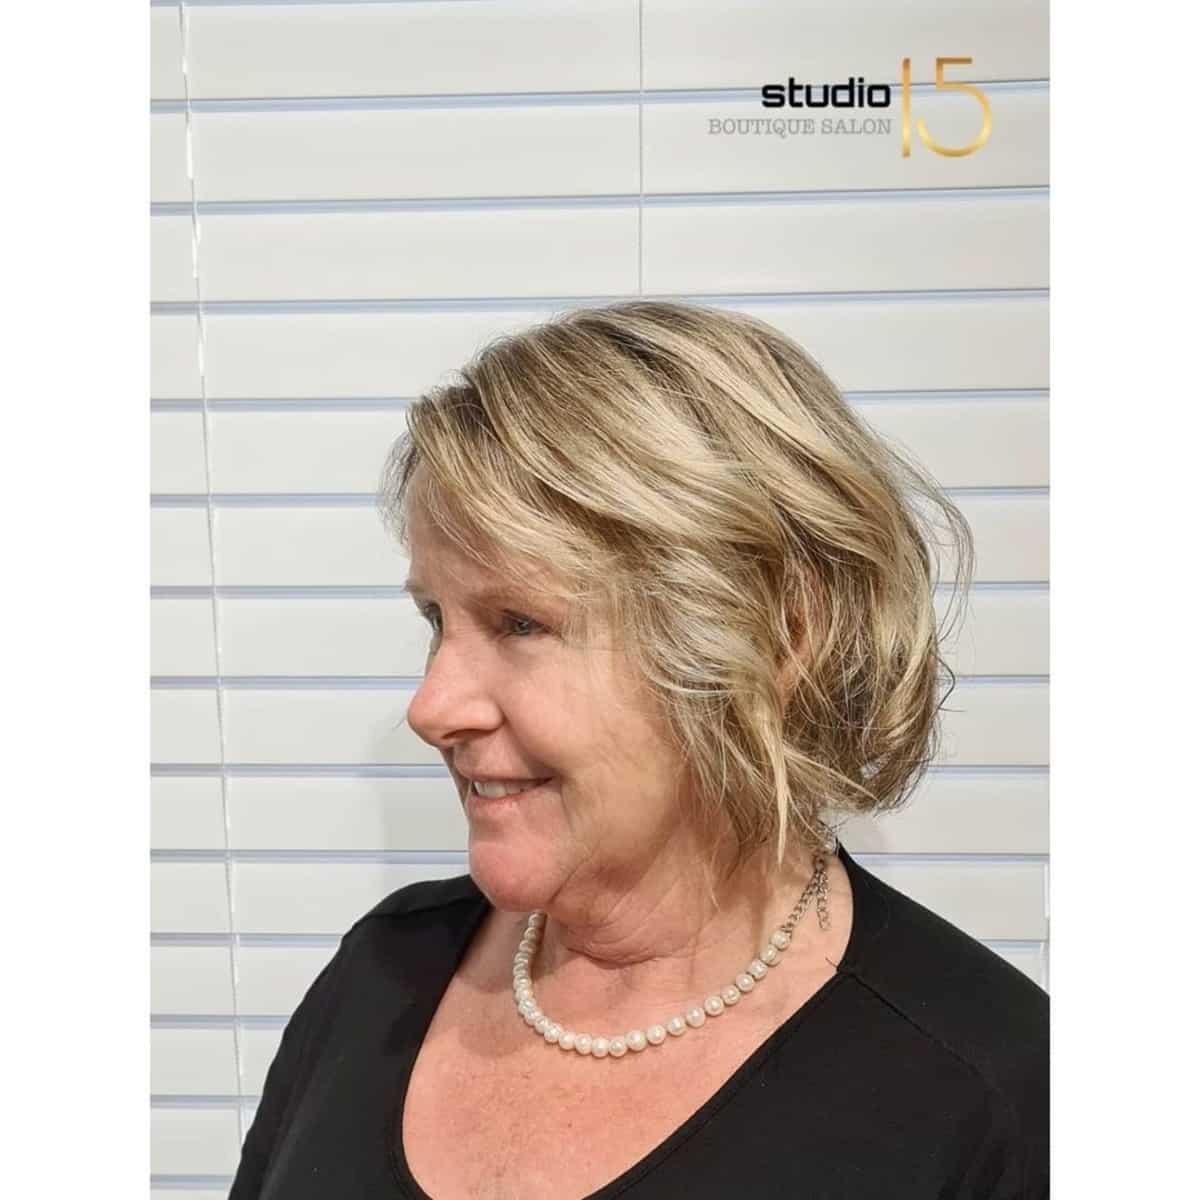 bob rubio corto invertido para mujeres mayores con cabello fino